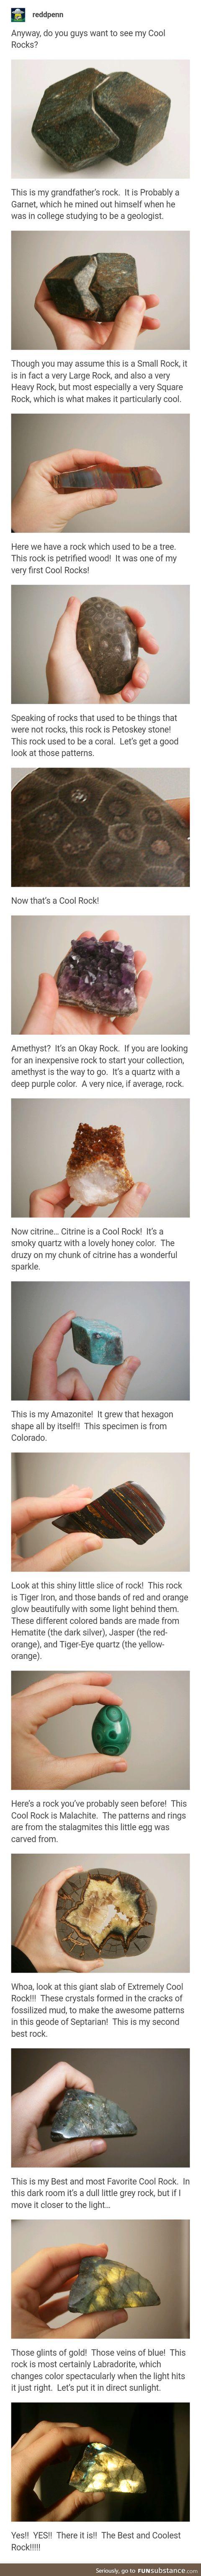 Geology jokes rock